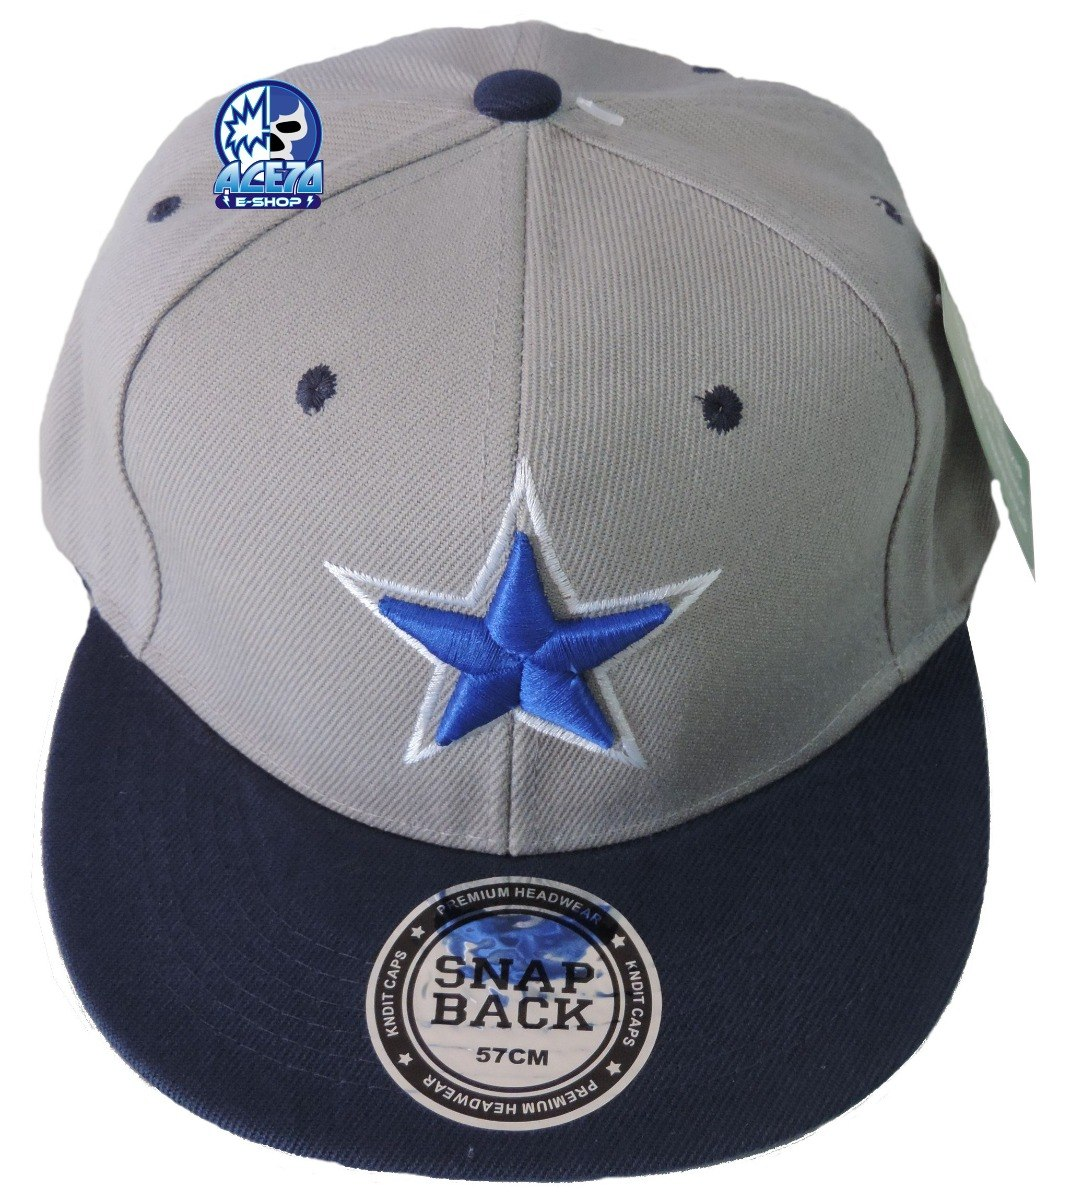 Dallas Cowboys Gorra Visera Plana Envio Gratis Nfl Danbr68 ... e96f6378ae5